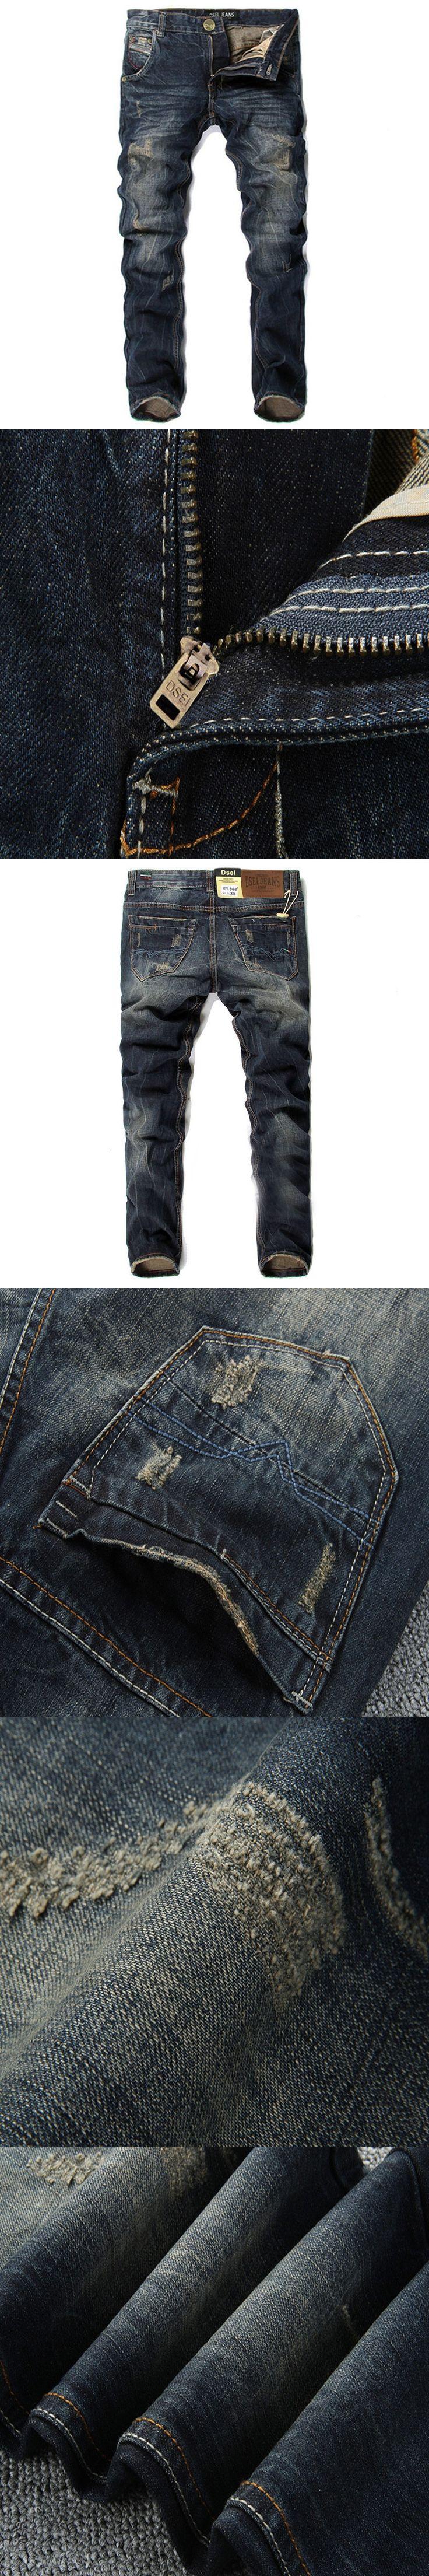 Mens Jeans Homme Brand Jean Arrival Design Slim Fit Fashion Jeans denim Pants Overalls Men Good Quality Black Skinny Pant Men